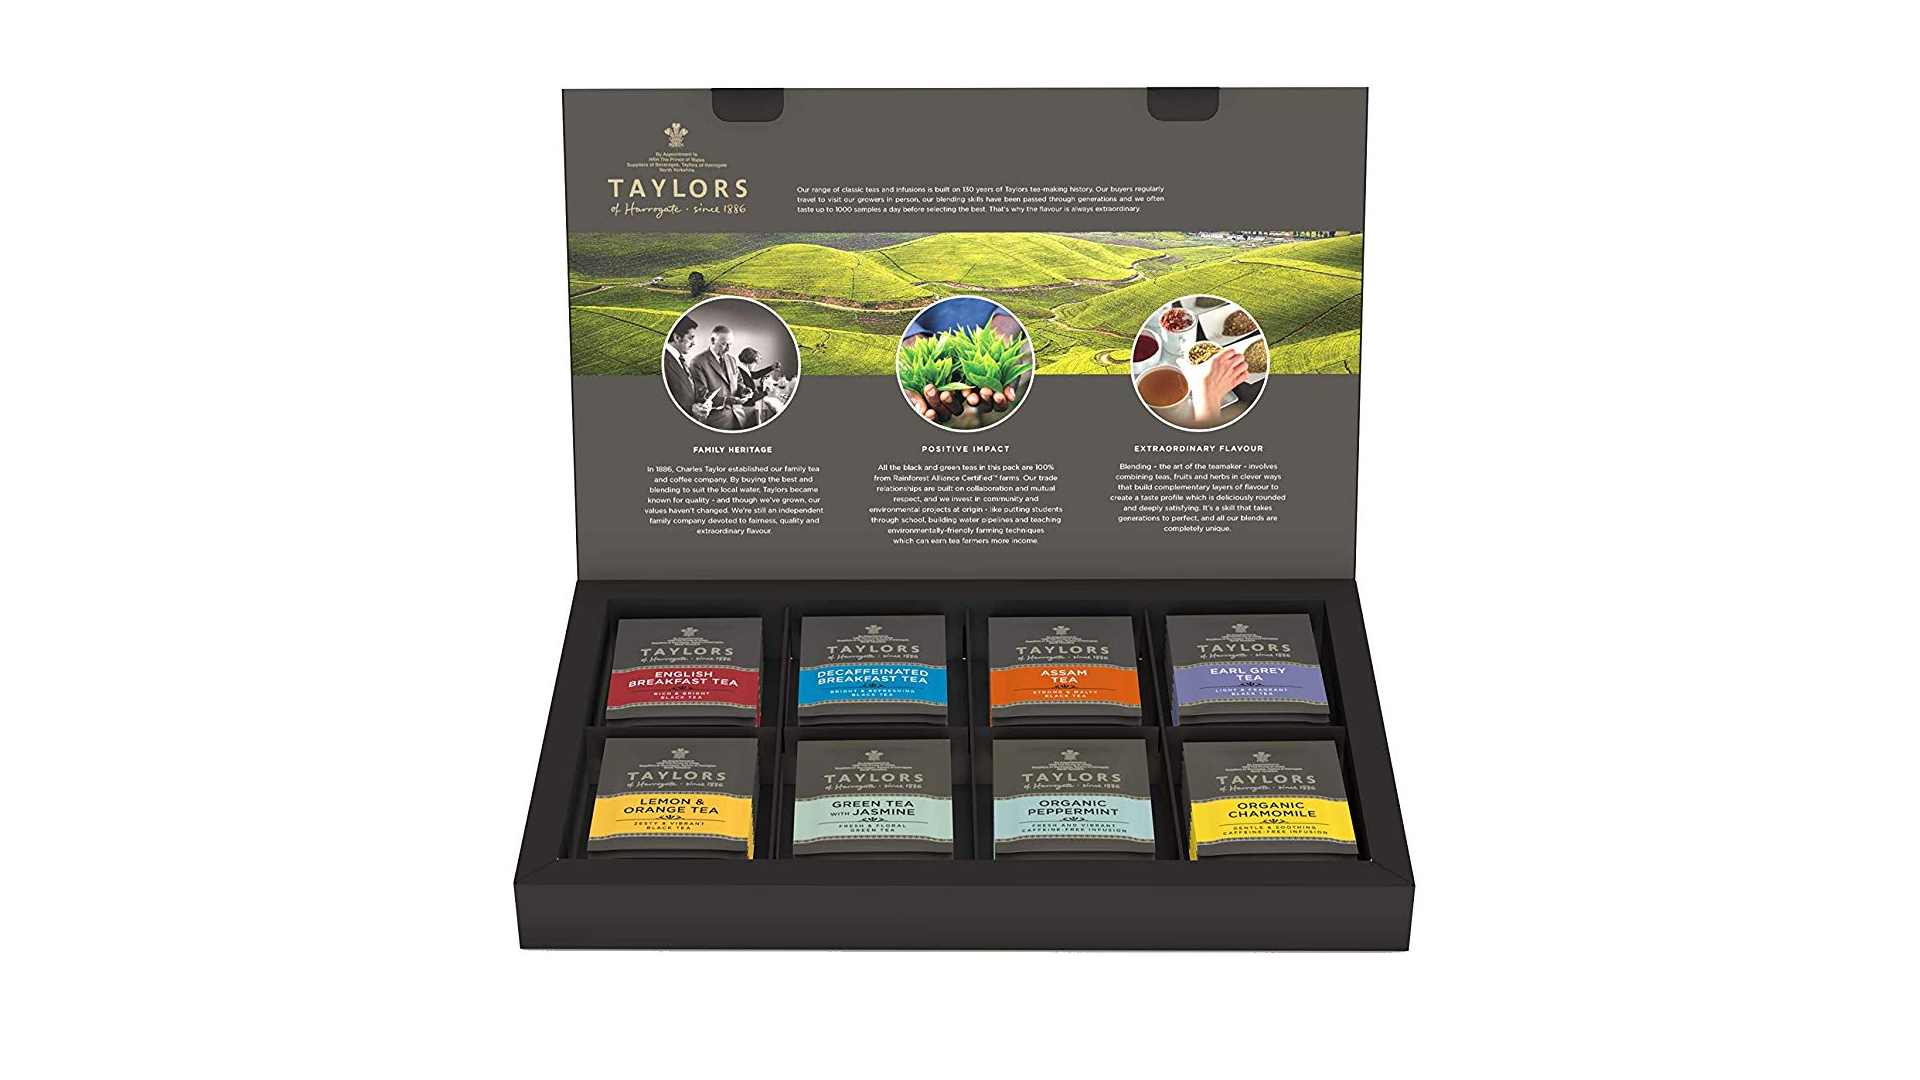 The Taylors of Harrogate tea sampler.